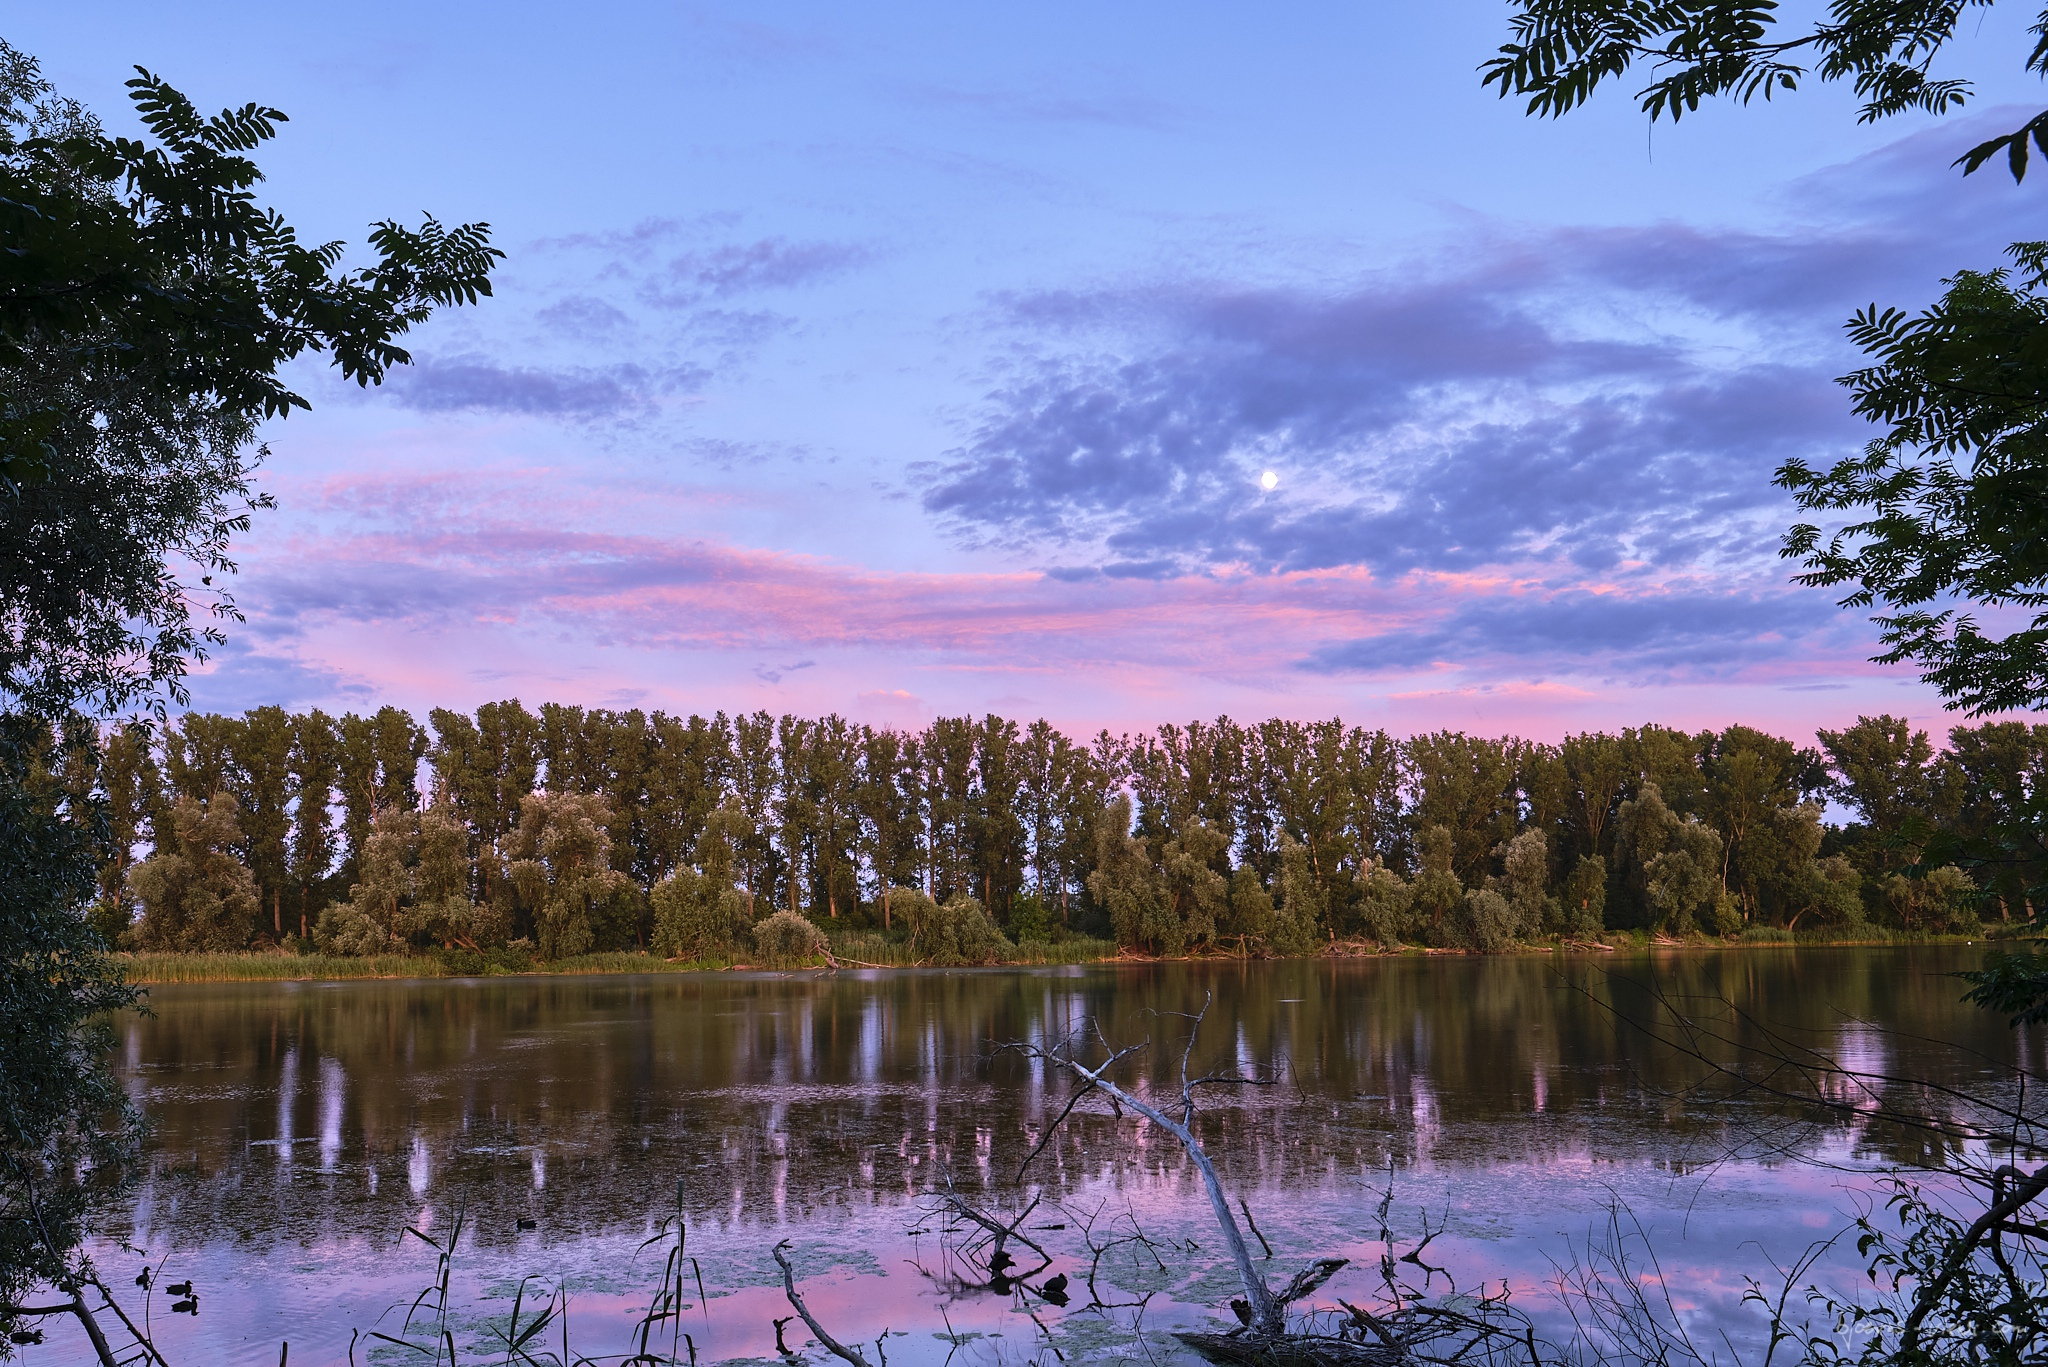 Bobenheim-Roxheim, Spaziergang, Sonnenuntergang, Makro, Macro, Himmel, Sky, Farben,